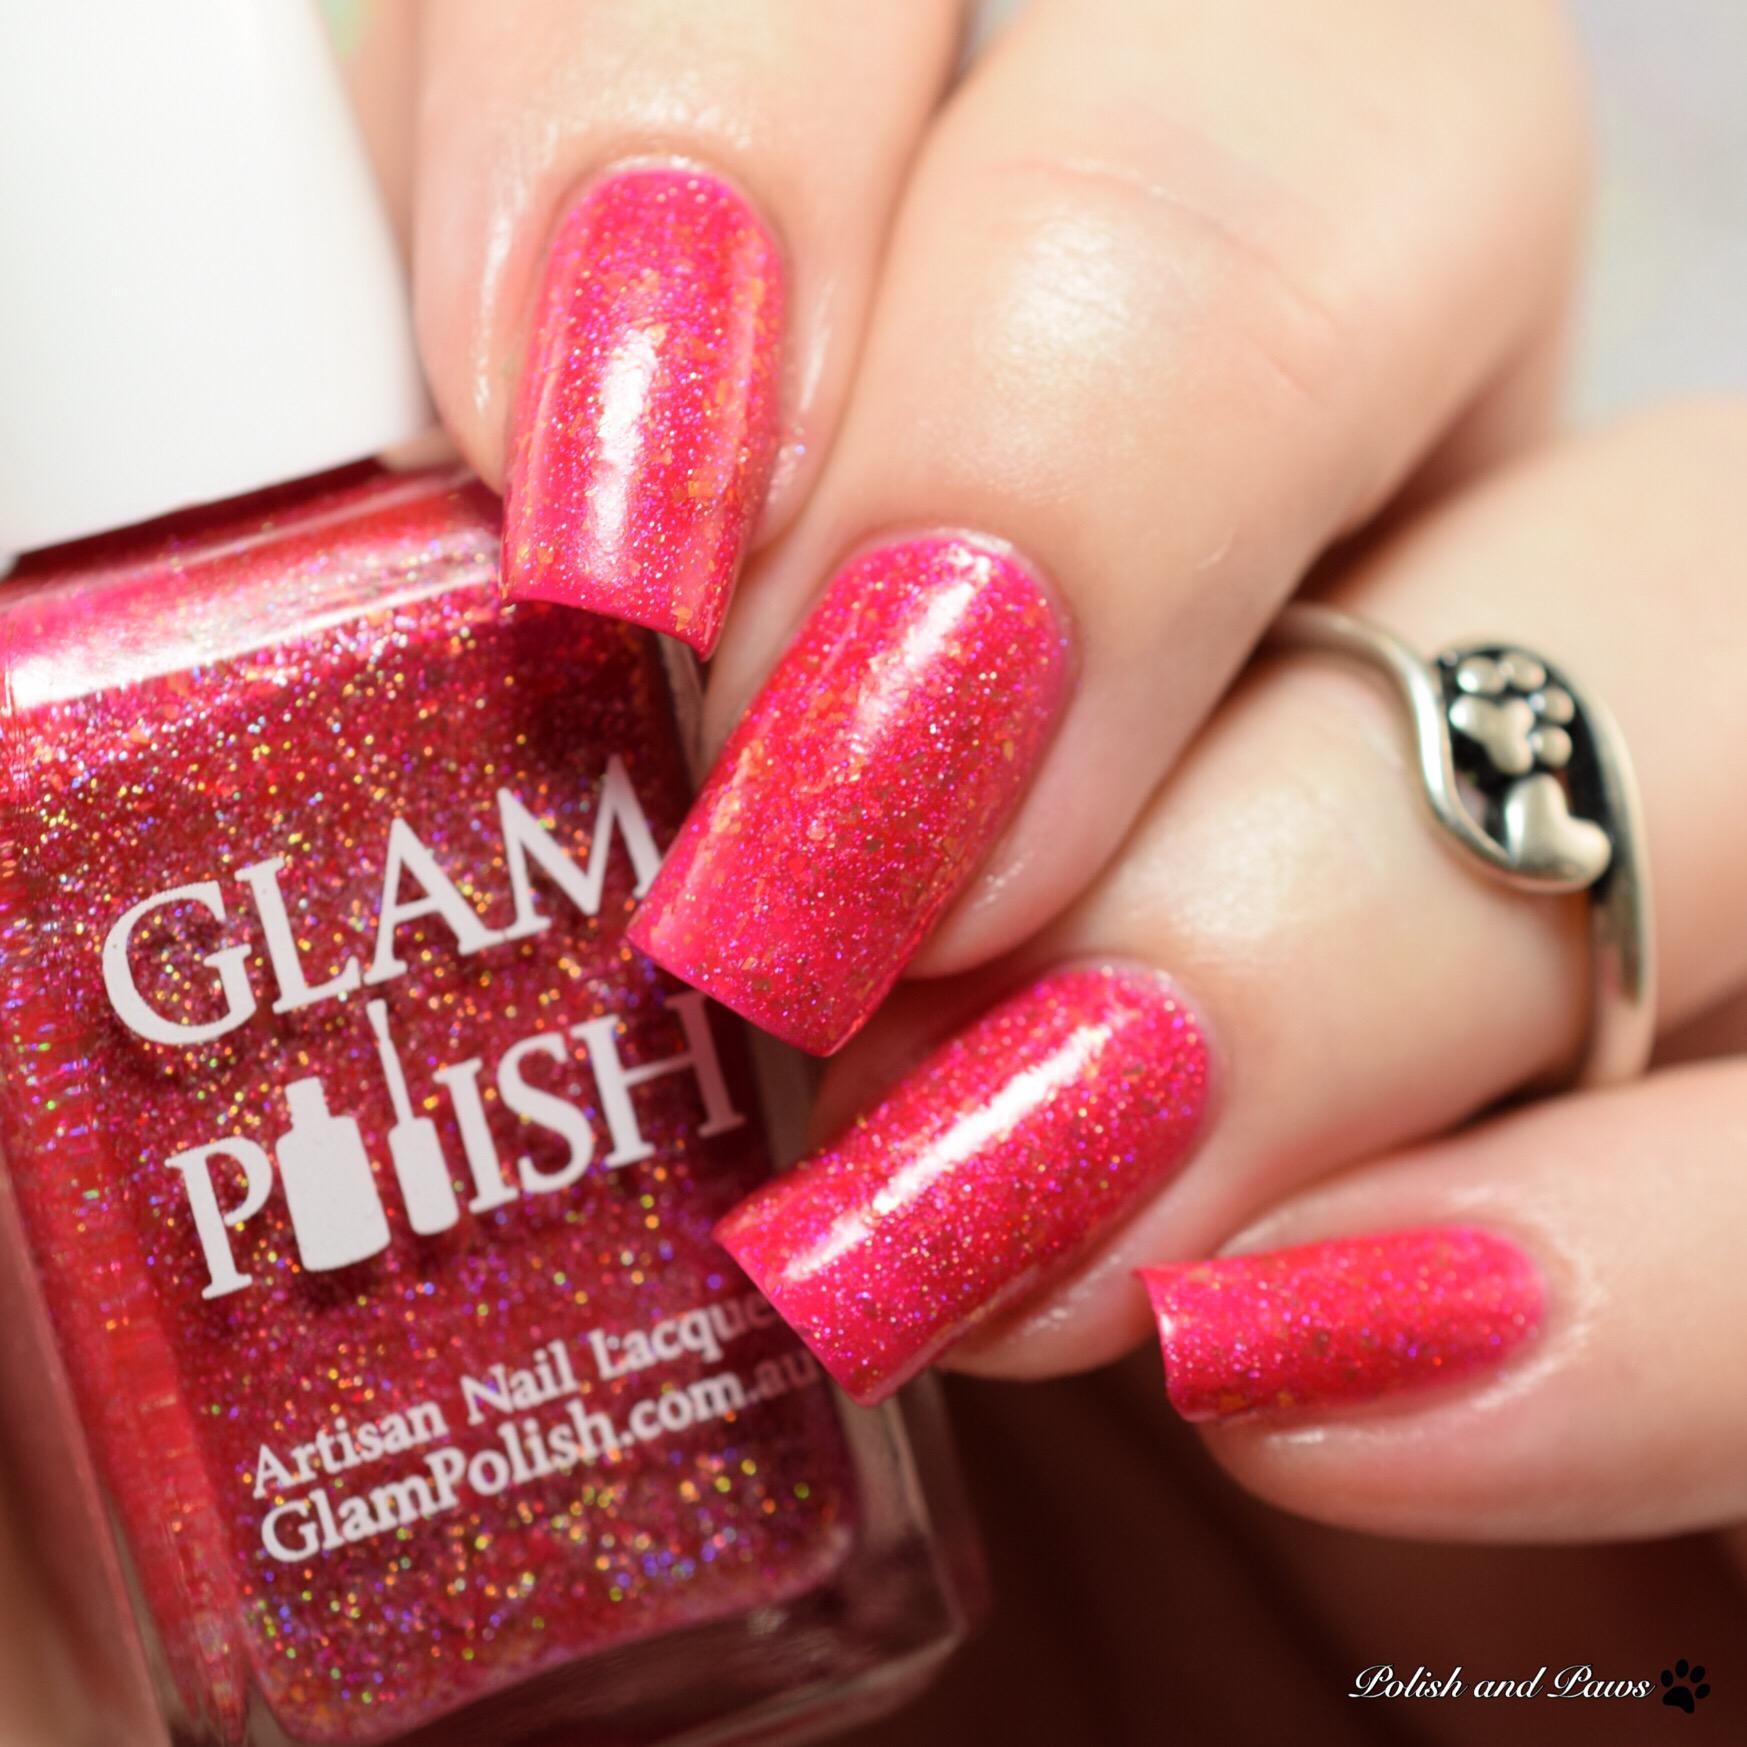 Glam Polish Peachy Keen, Jelly Bean